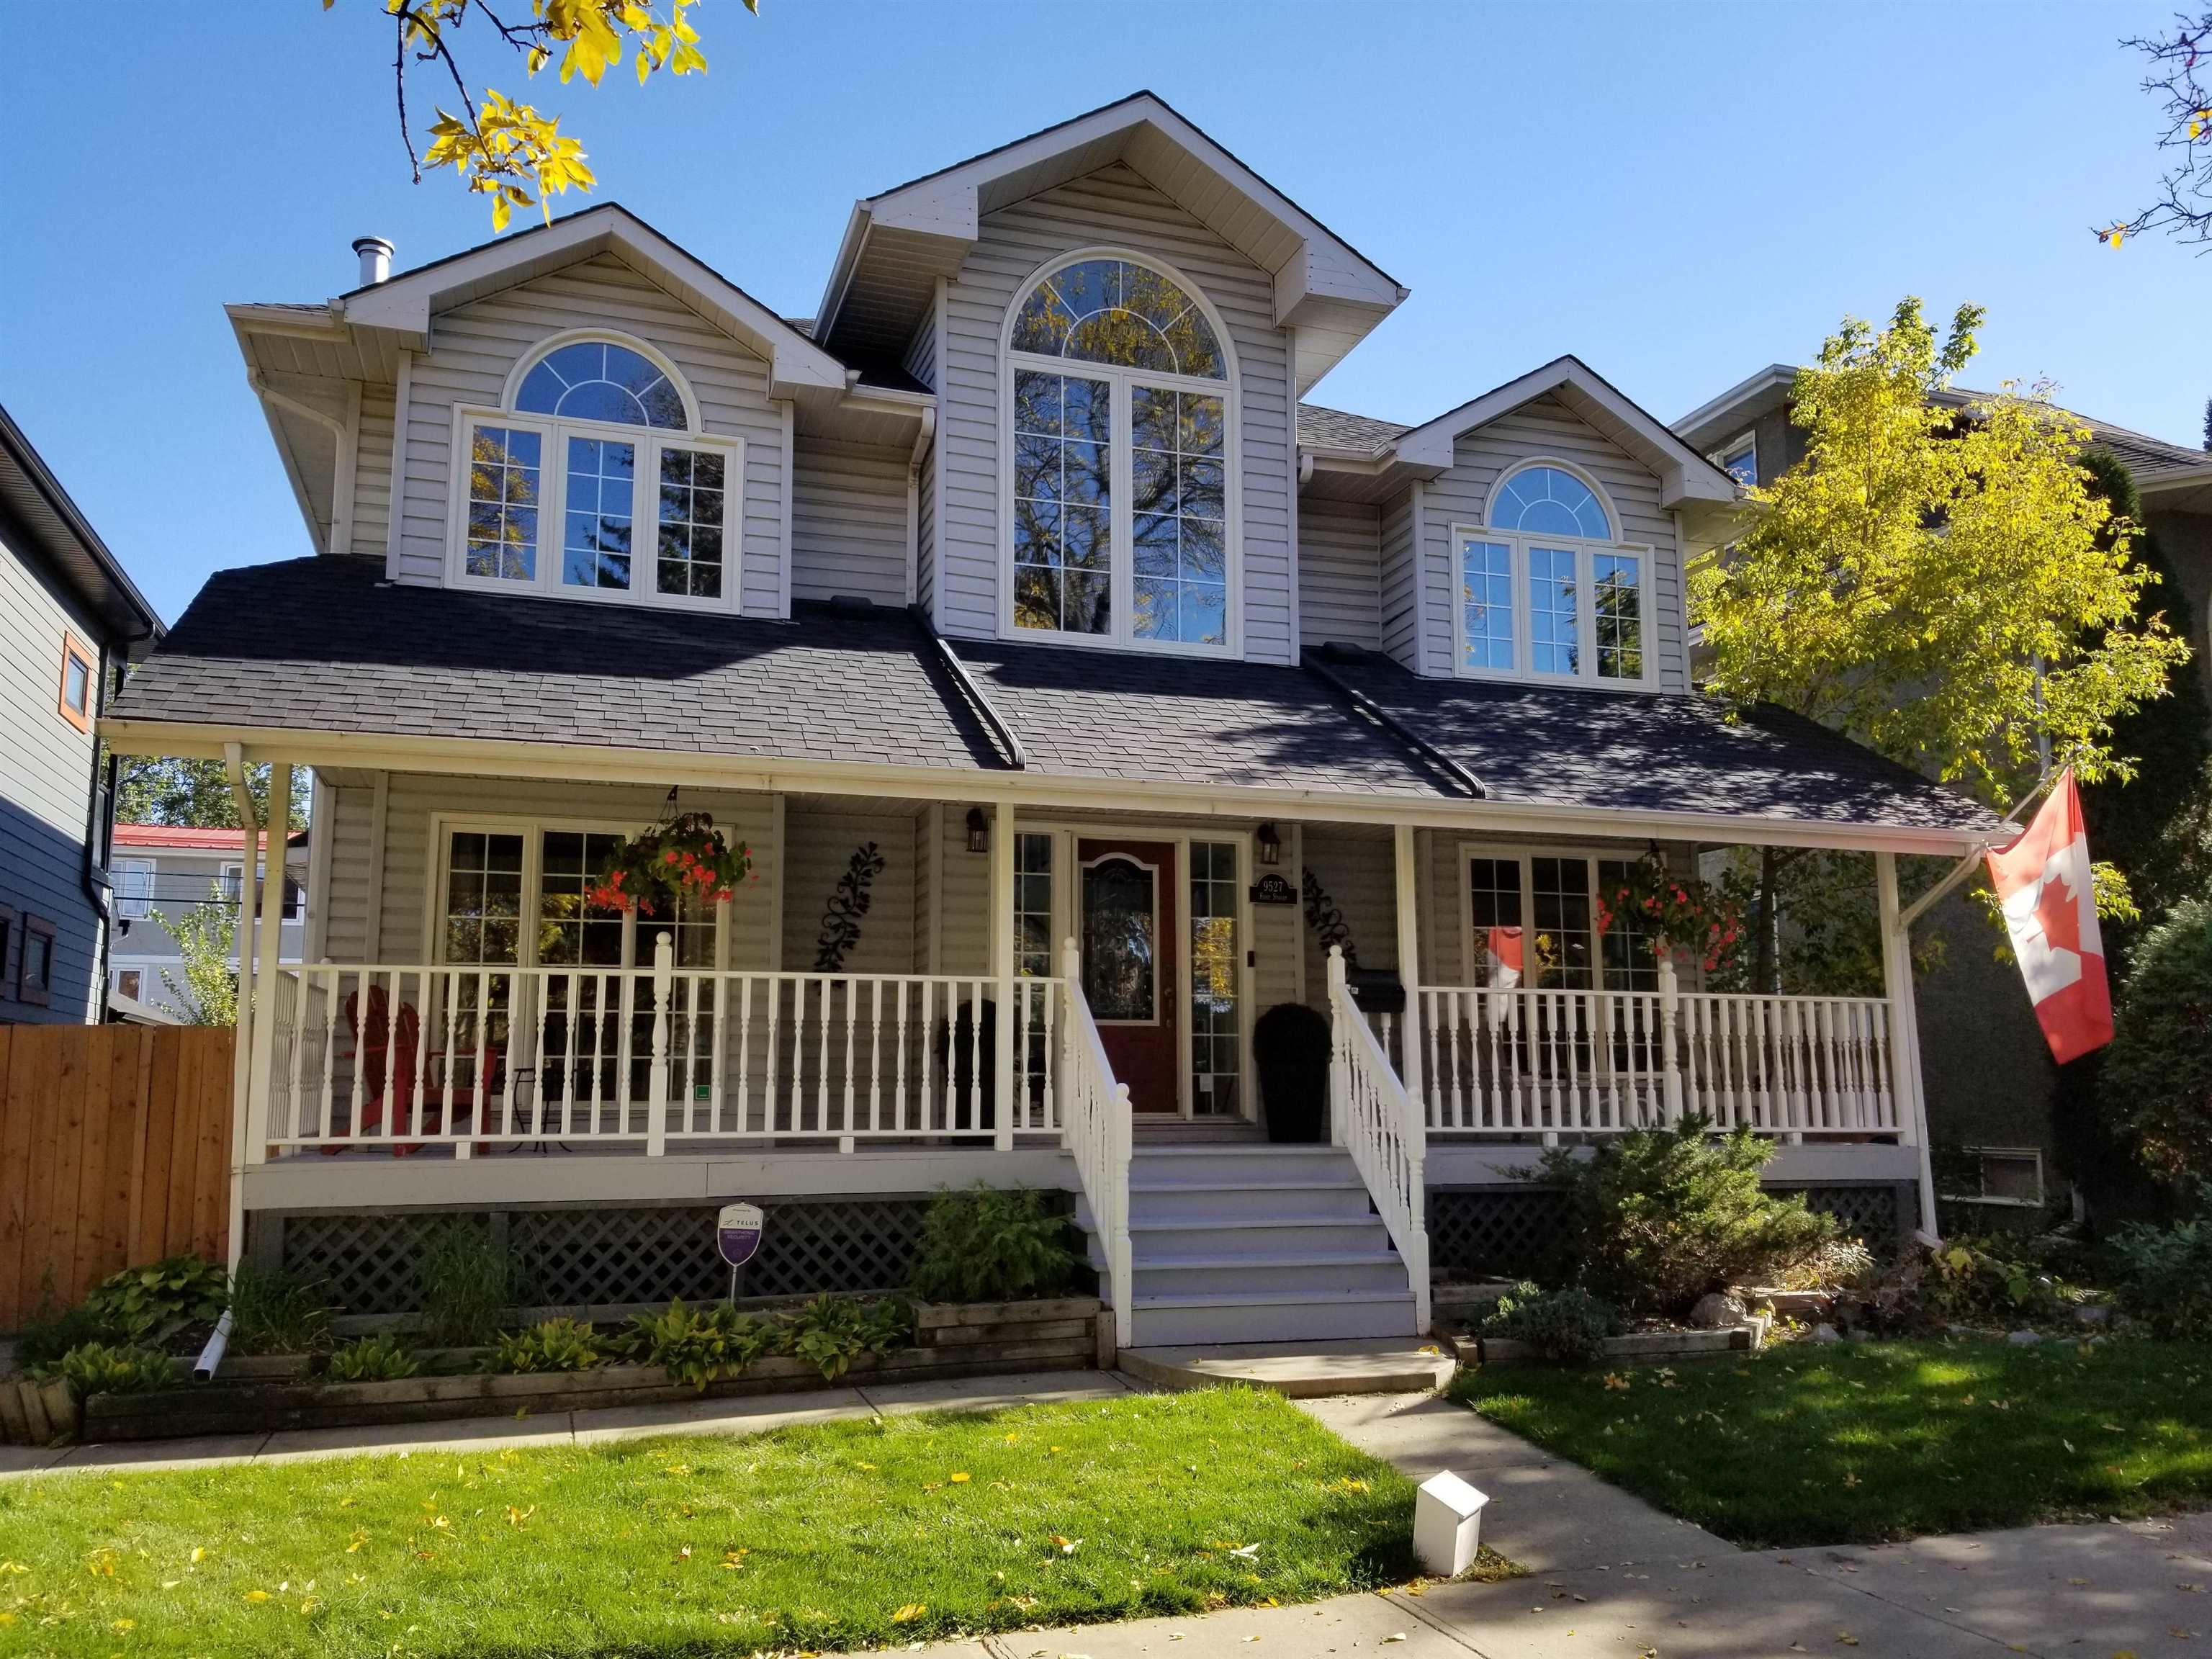 Main Photo: 9527 101 Street in Edmonton: Zone 12 House for sale : MLS®# E4264743